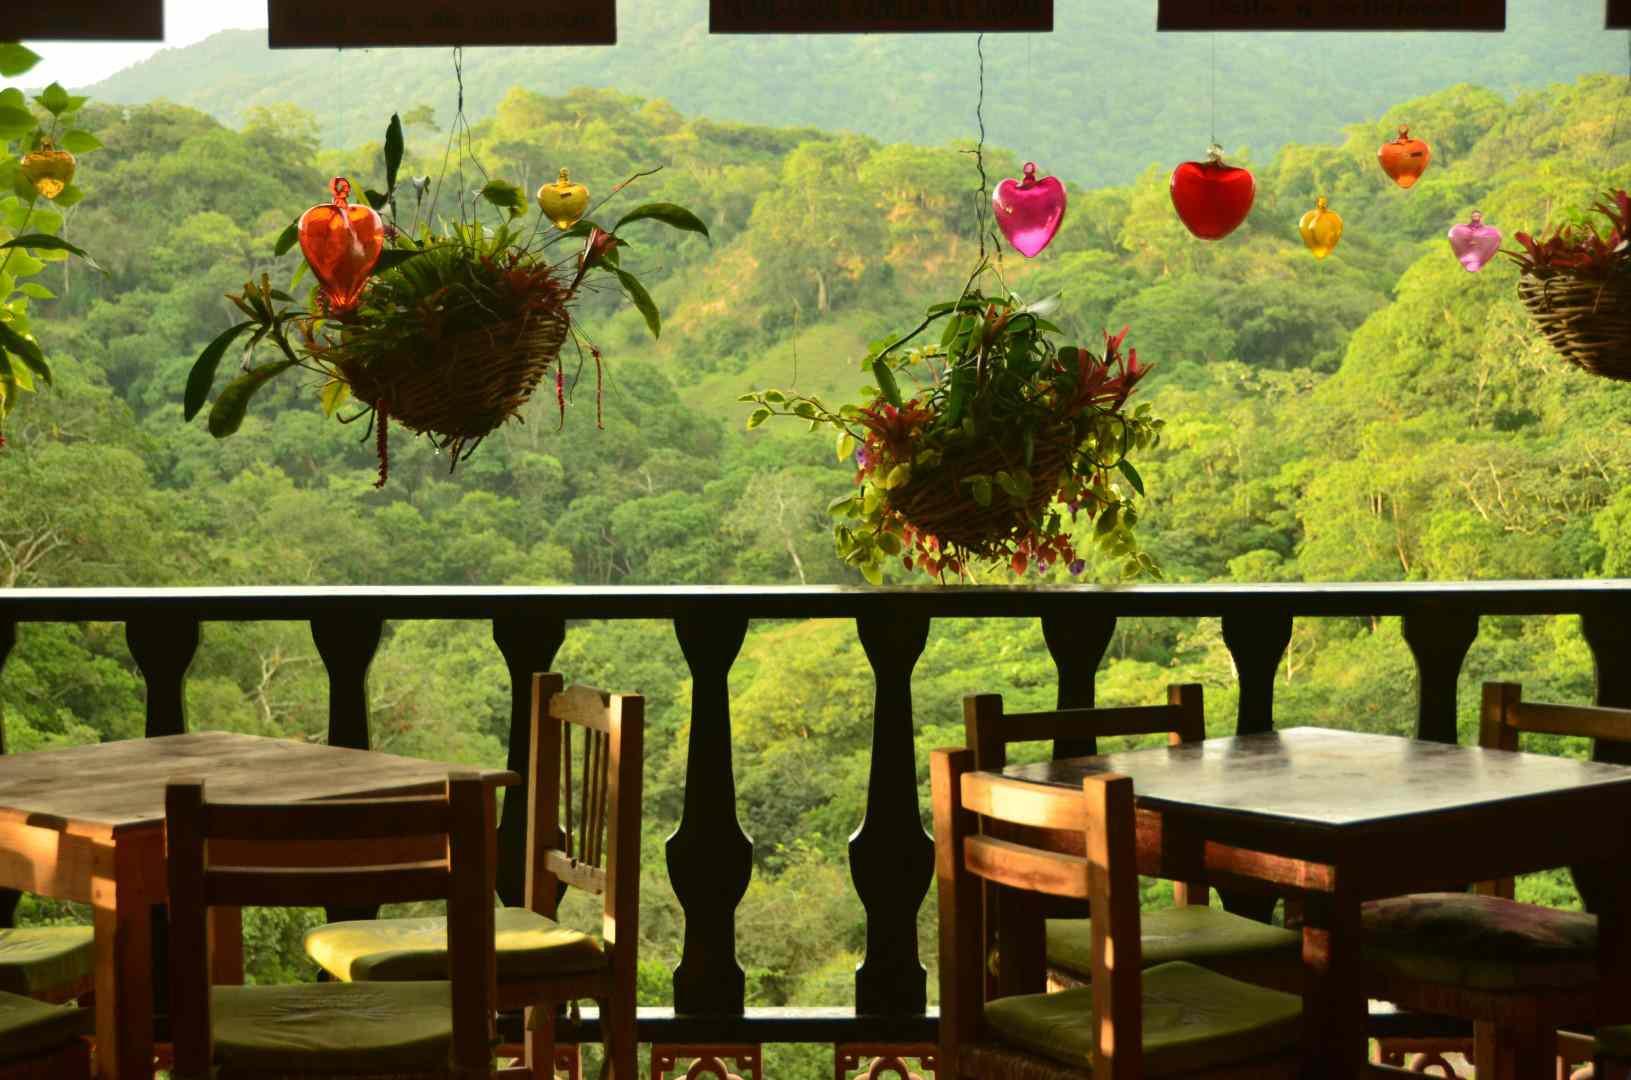 At the restaurant in the Vallarta Botanical Garden